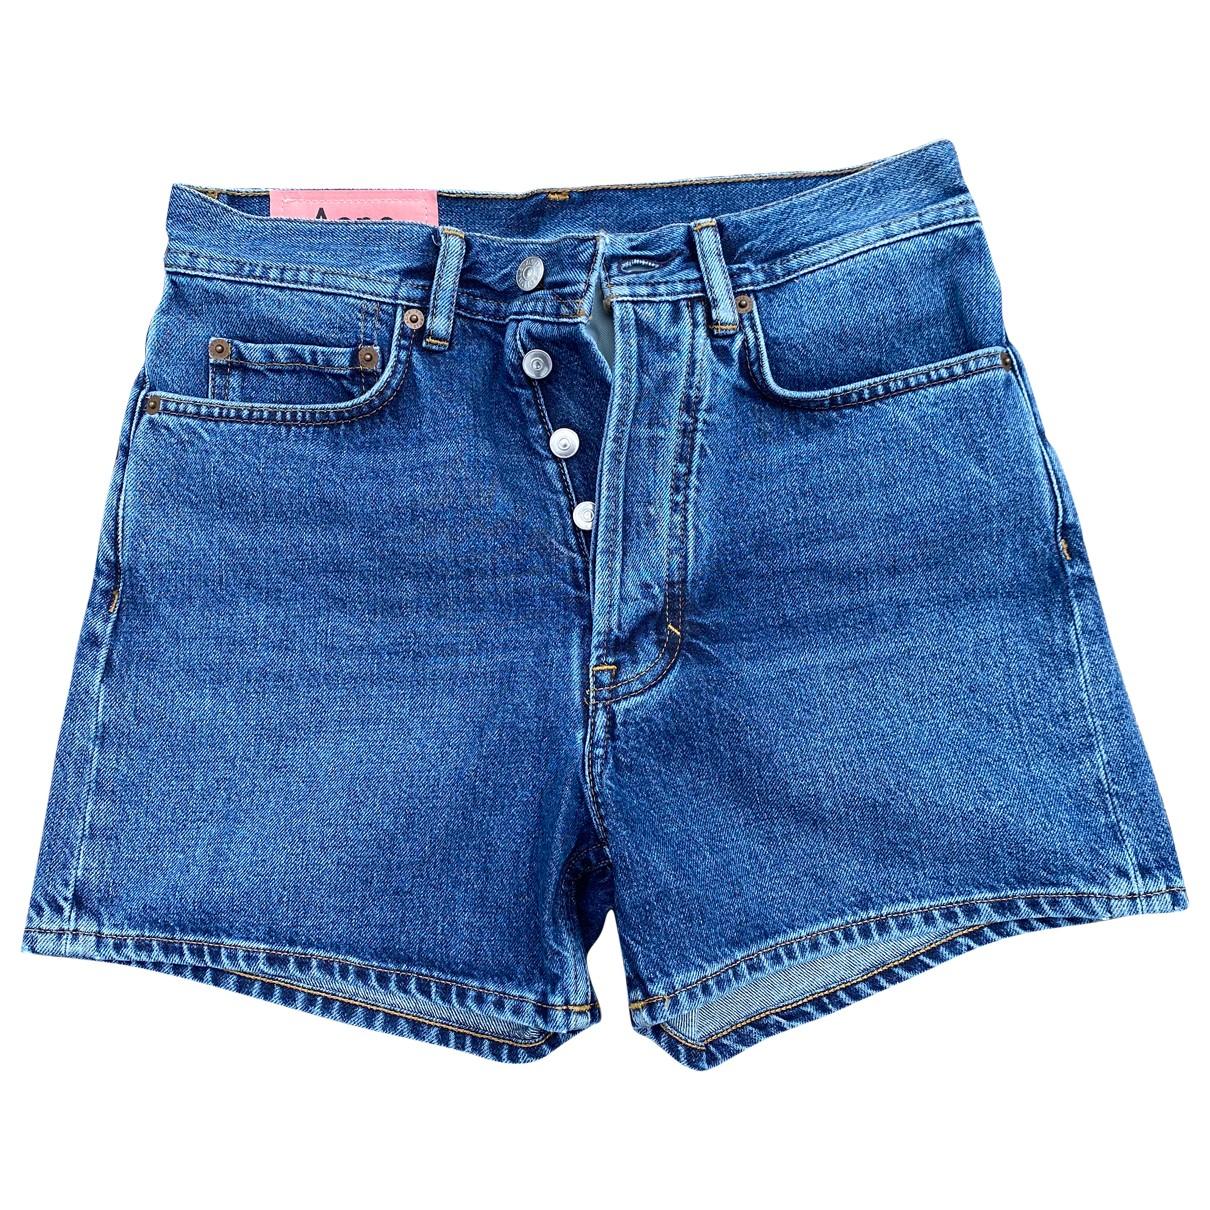 Acne Studios \N Shorts in  Blau Denim - Jeans